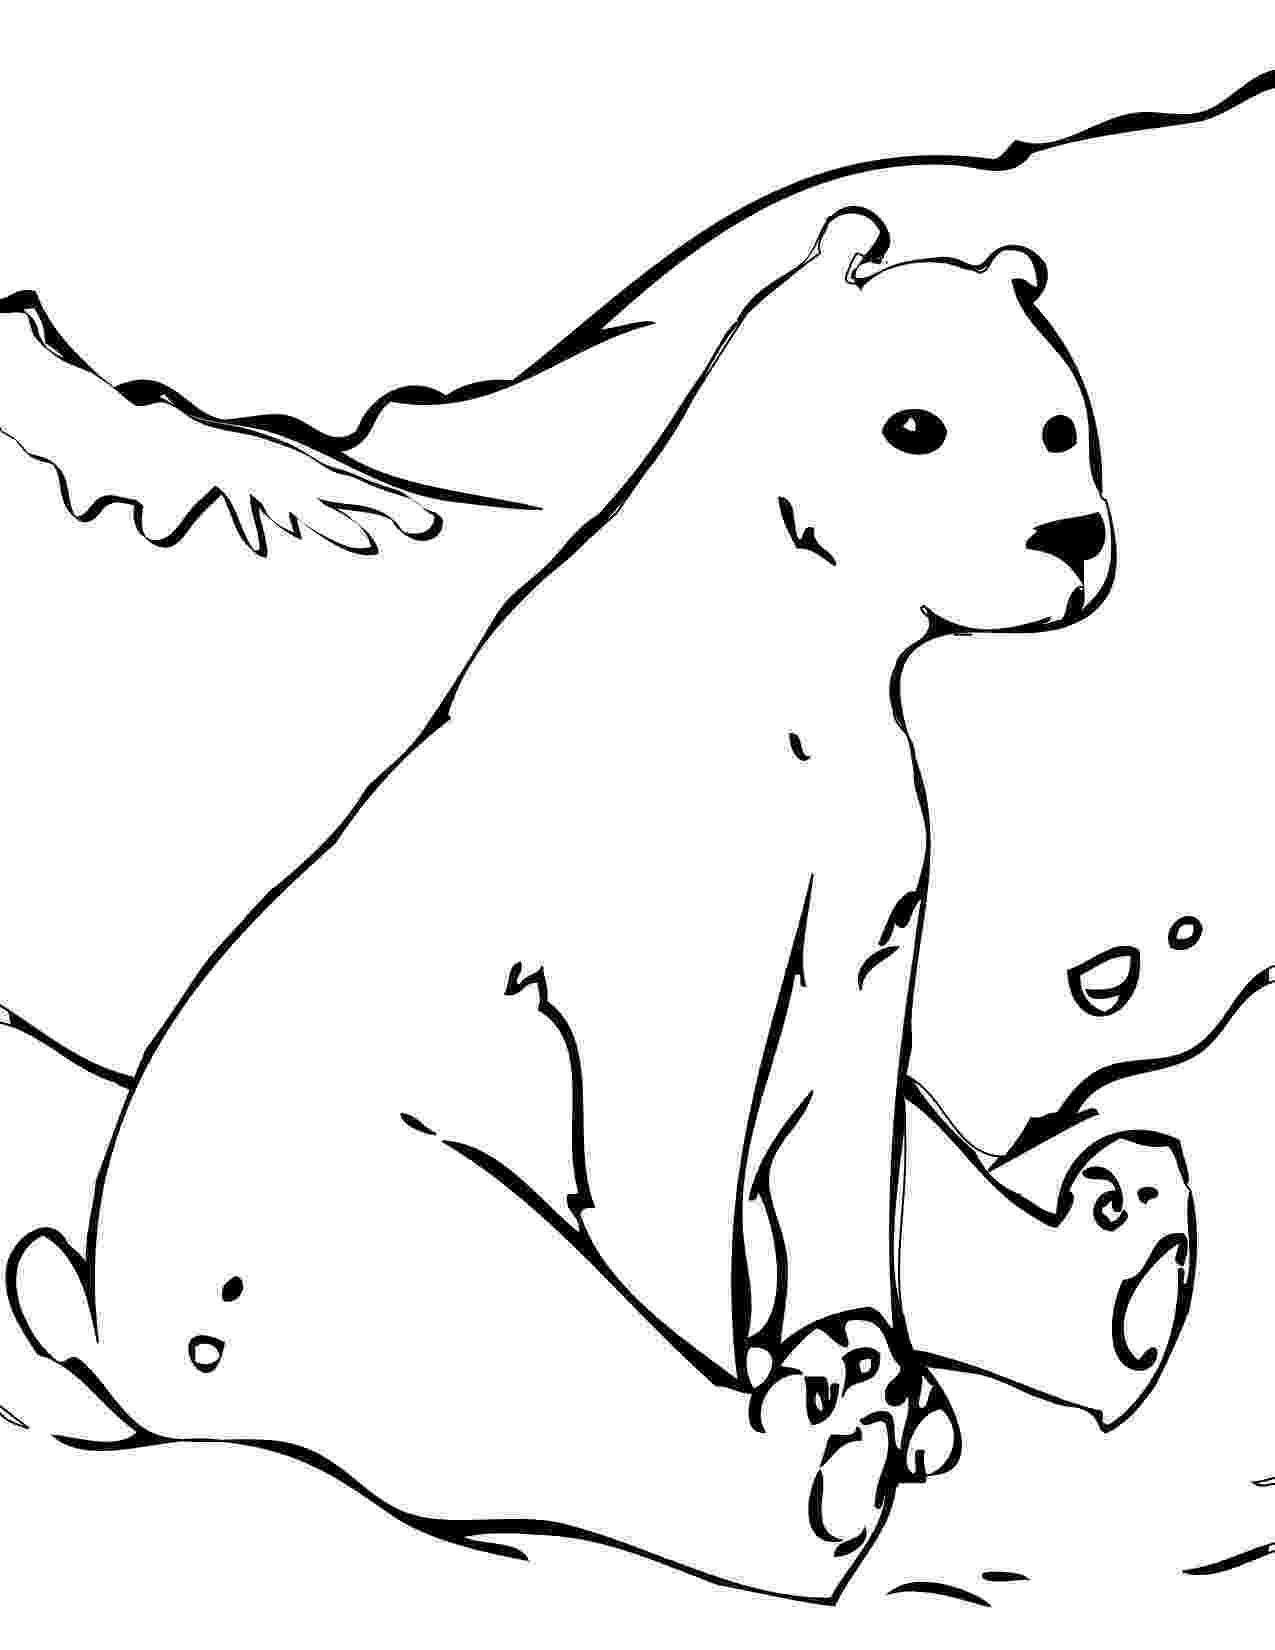 polar bear to color free printable polar bear coloring pages for kids to color bear polar